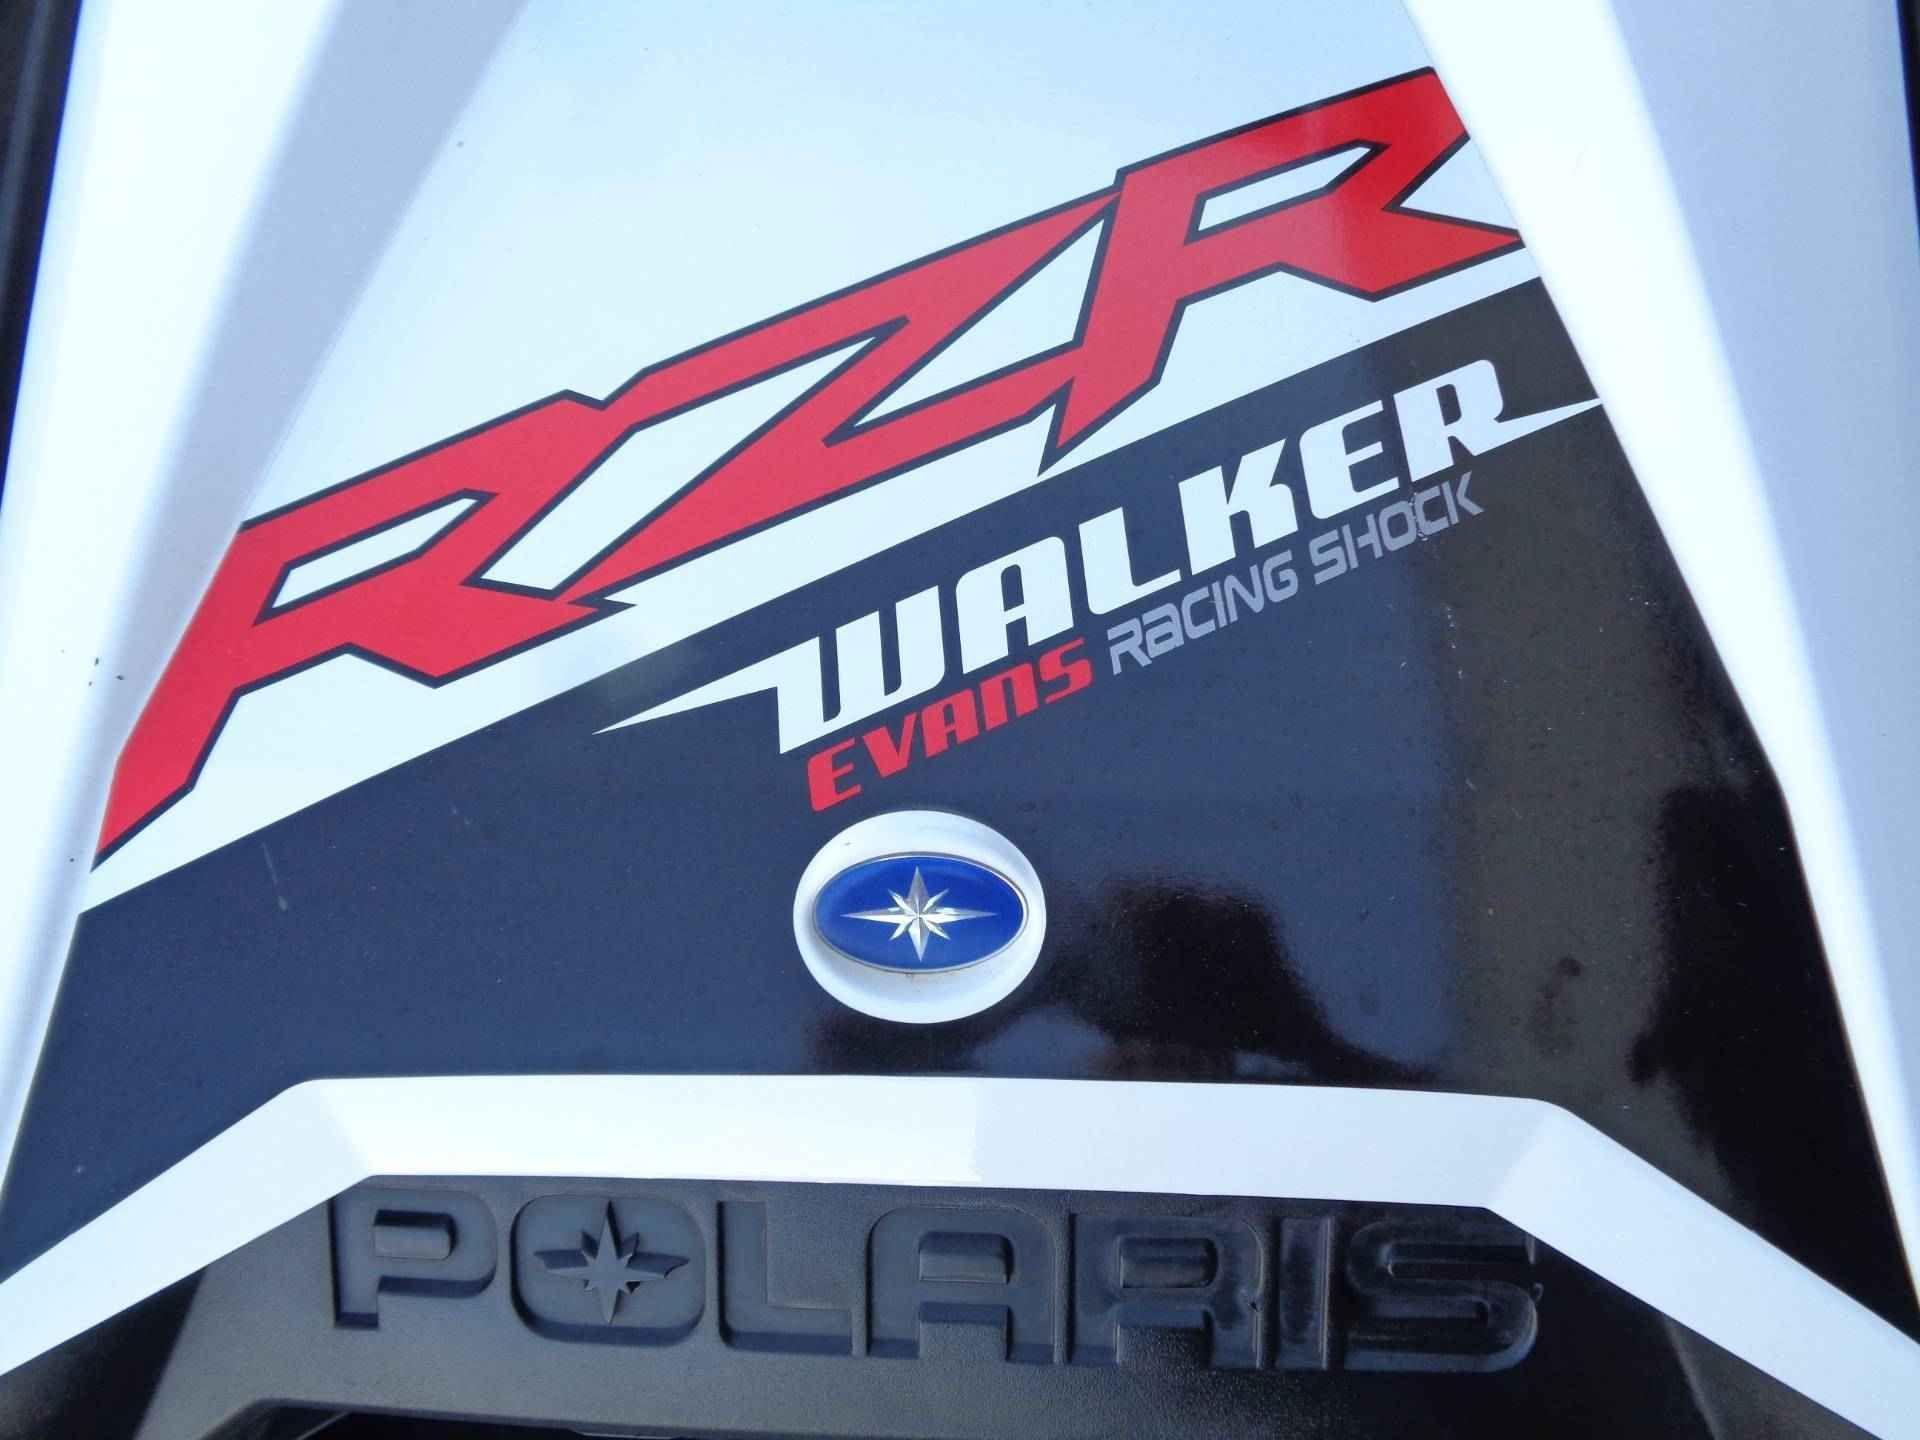 Car body sticker design eps - Used 2013 Polaris Rzr Xp 900 Eps Walker Evans Le Atvs For Sale In Oklahoma